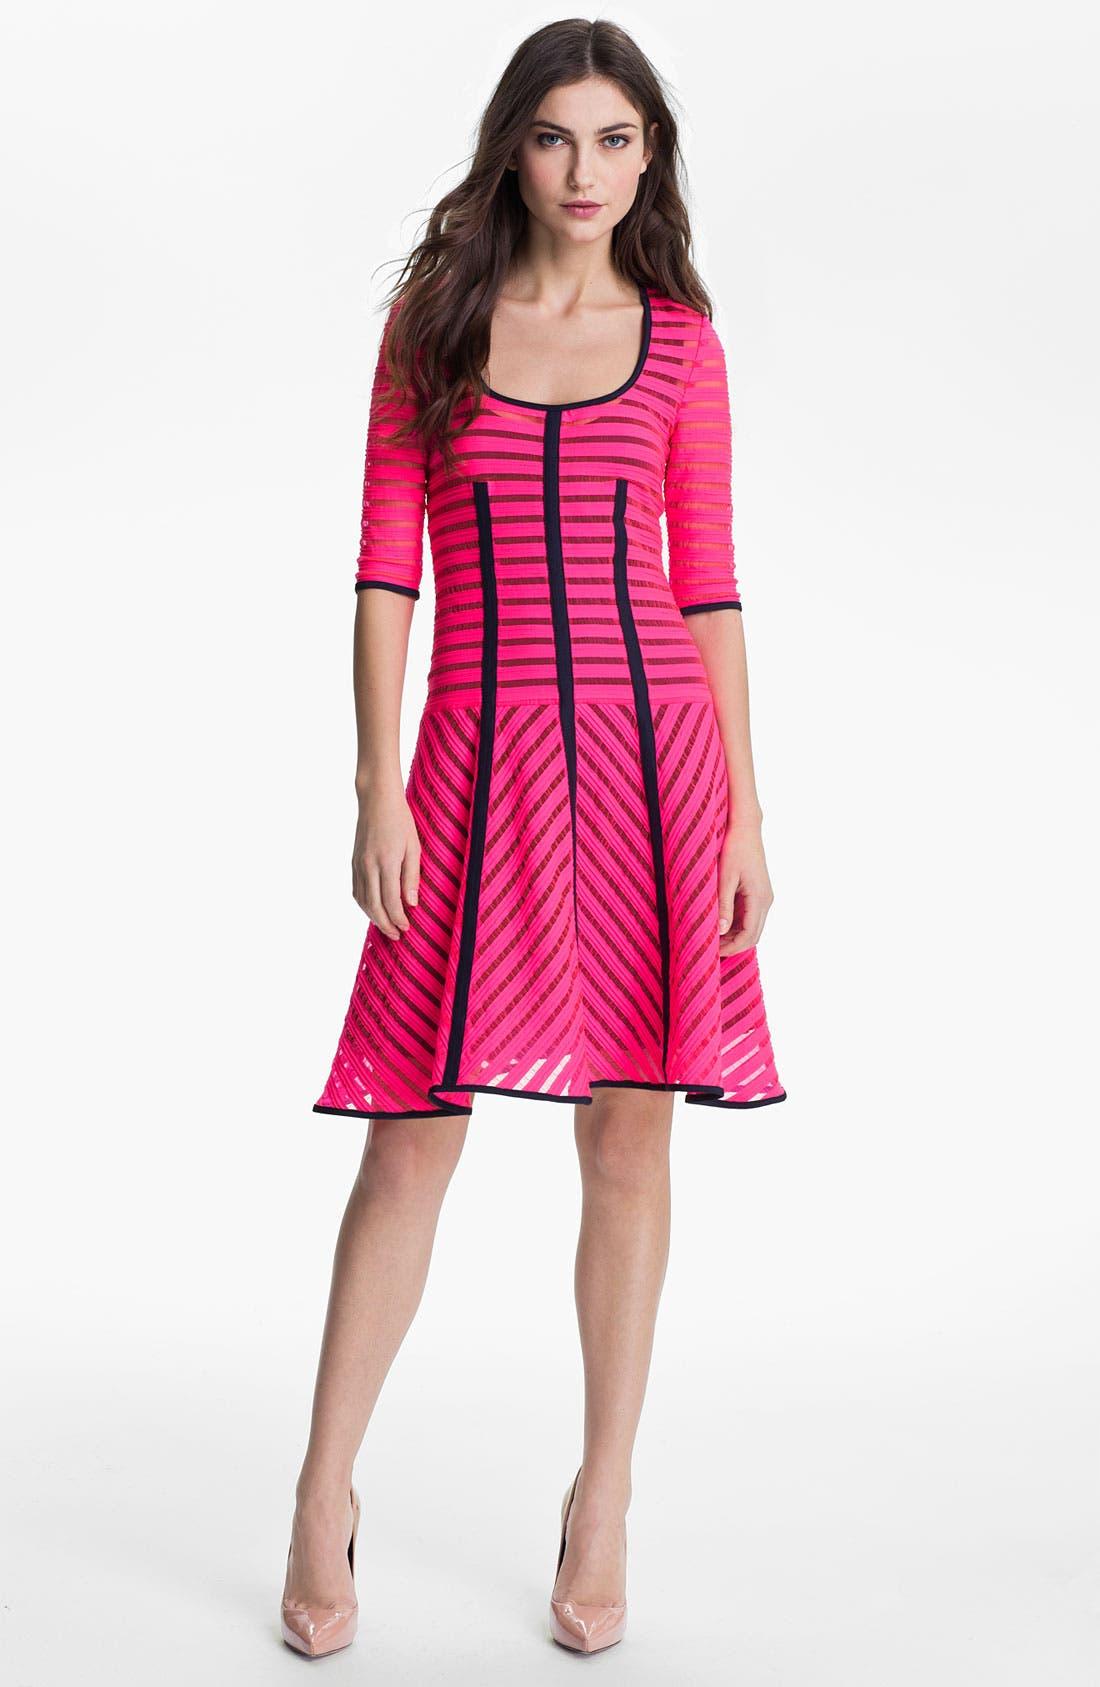 Alternate Image 1 Selected - Nanette Lepore '15 Minutes' A-Line Dress